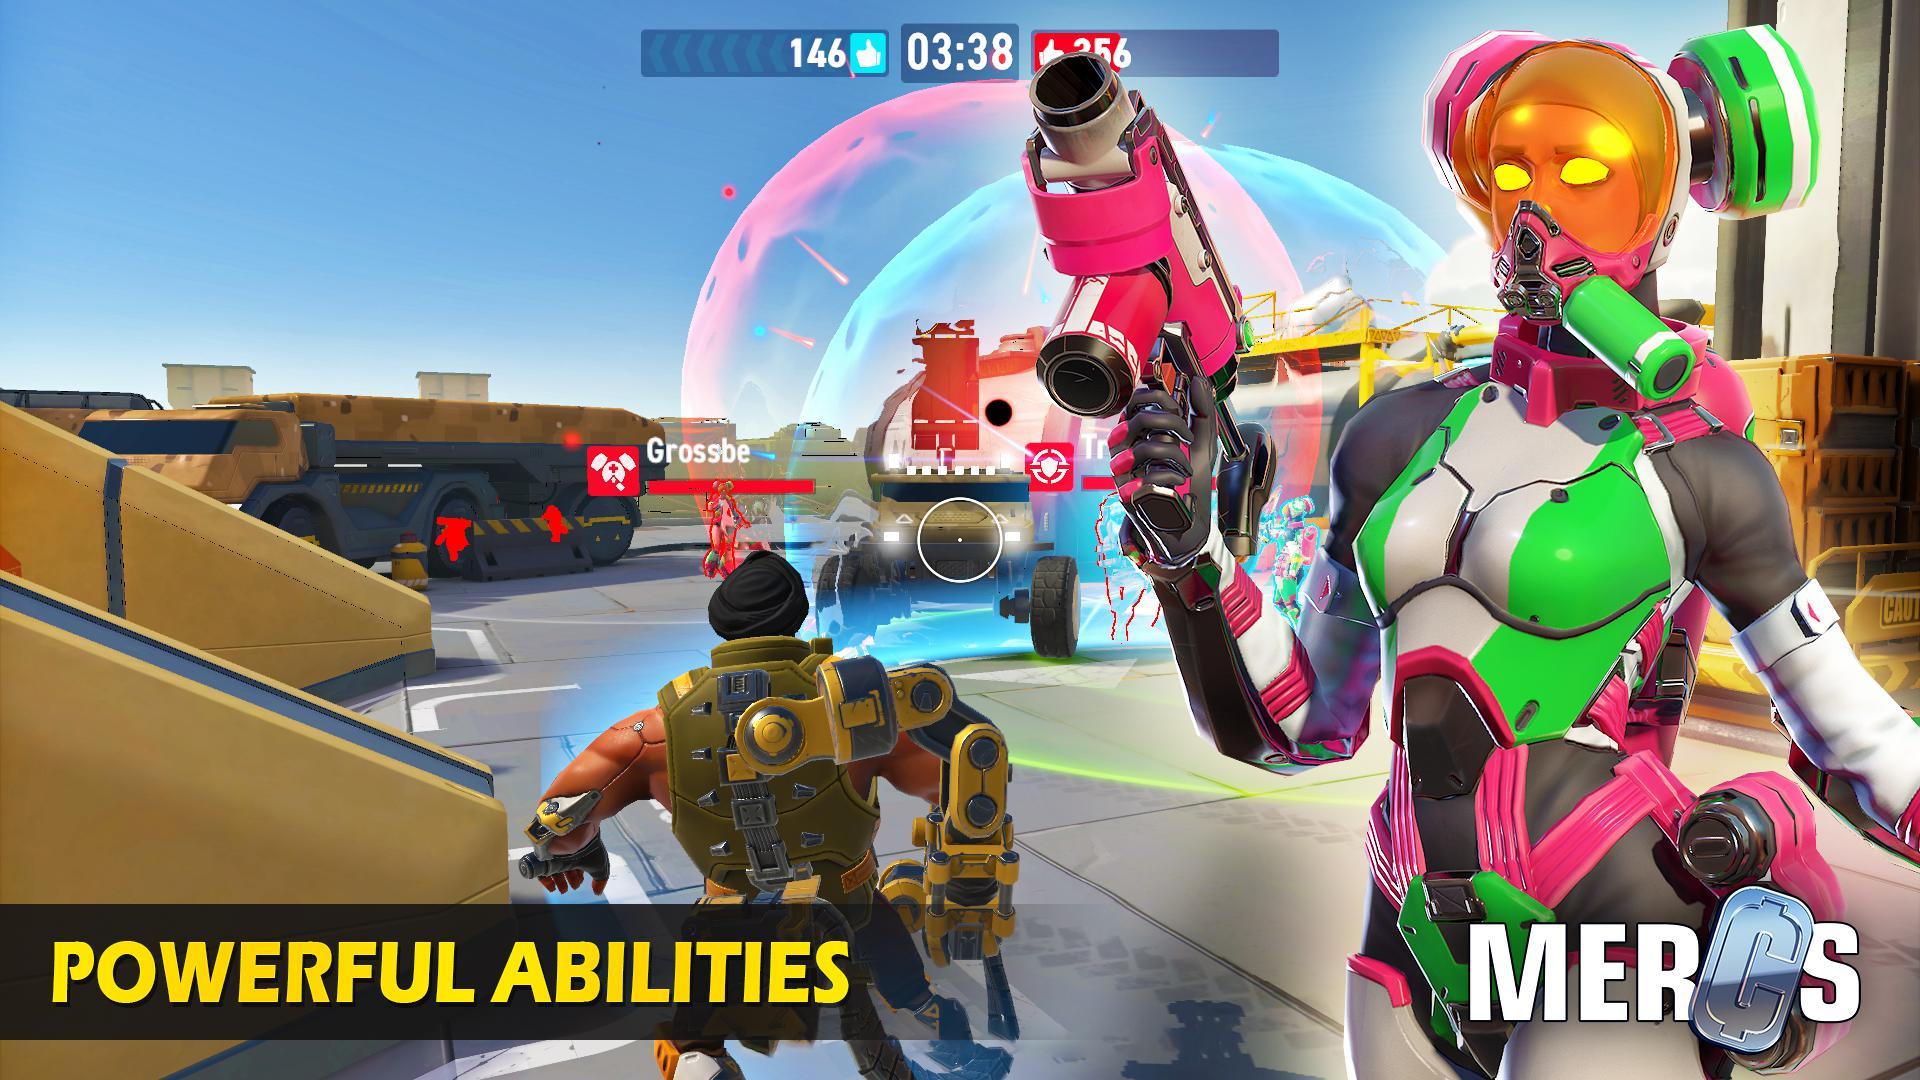 MERCS - Cyber strike arena. Multiplayer shooter! 游戏截图5